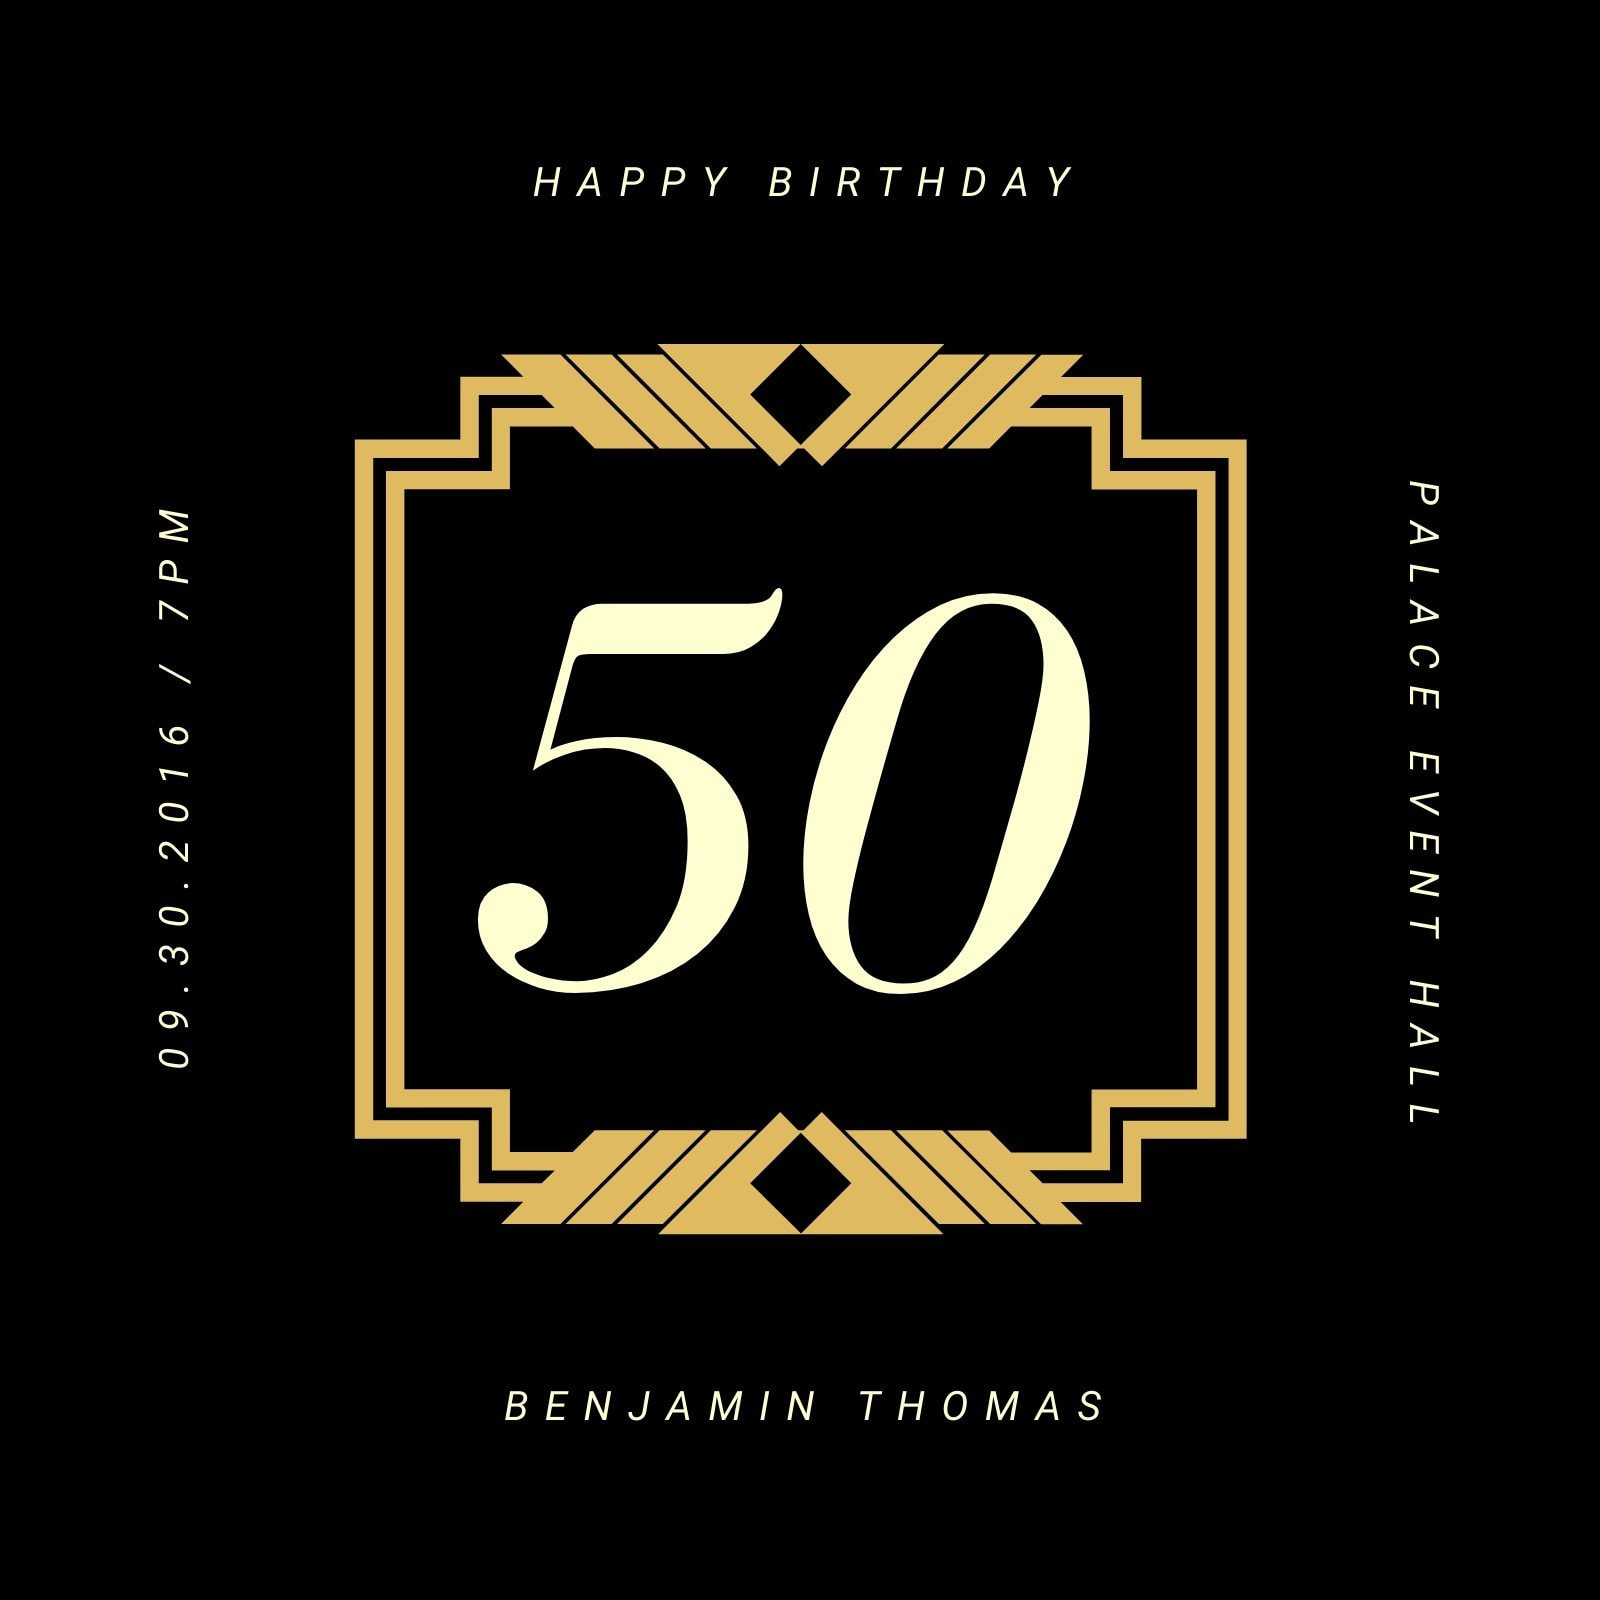 Gold and Black Elegant Bordered 50th Birthday Invitation